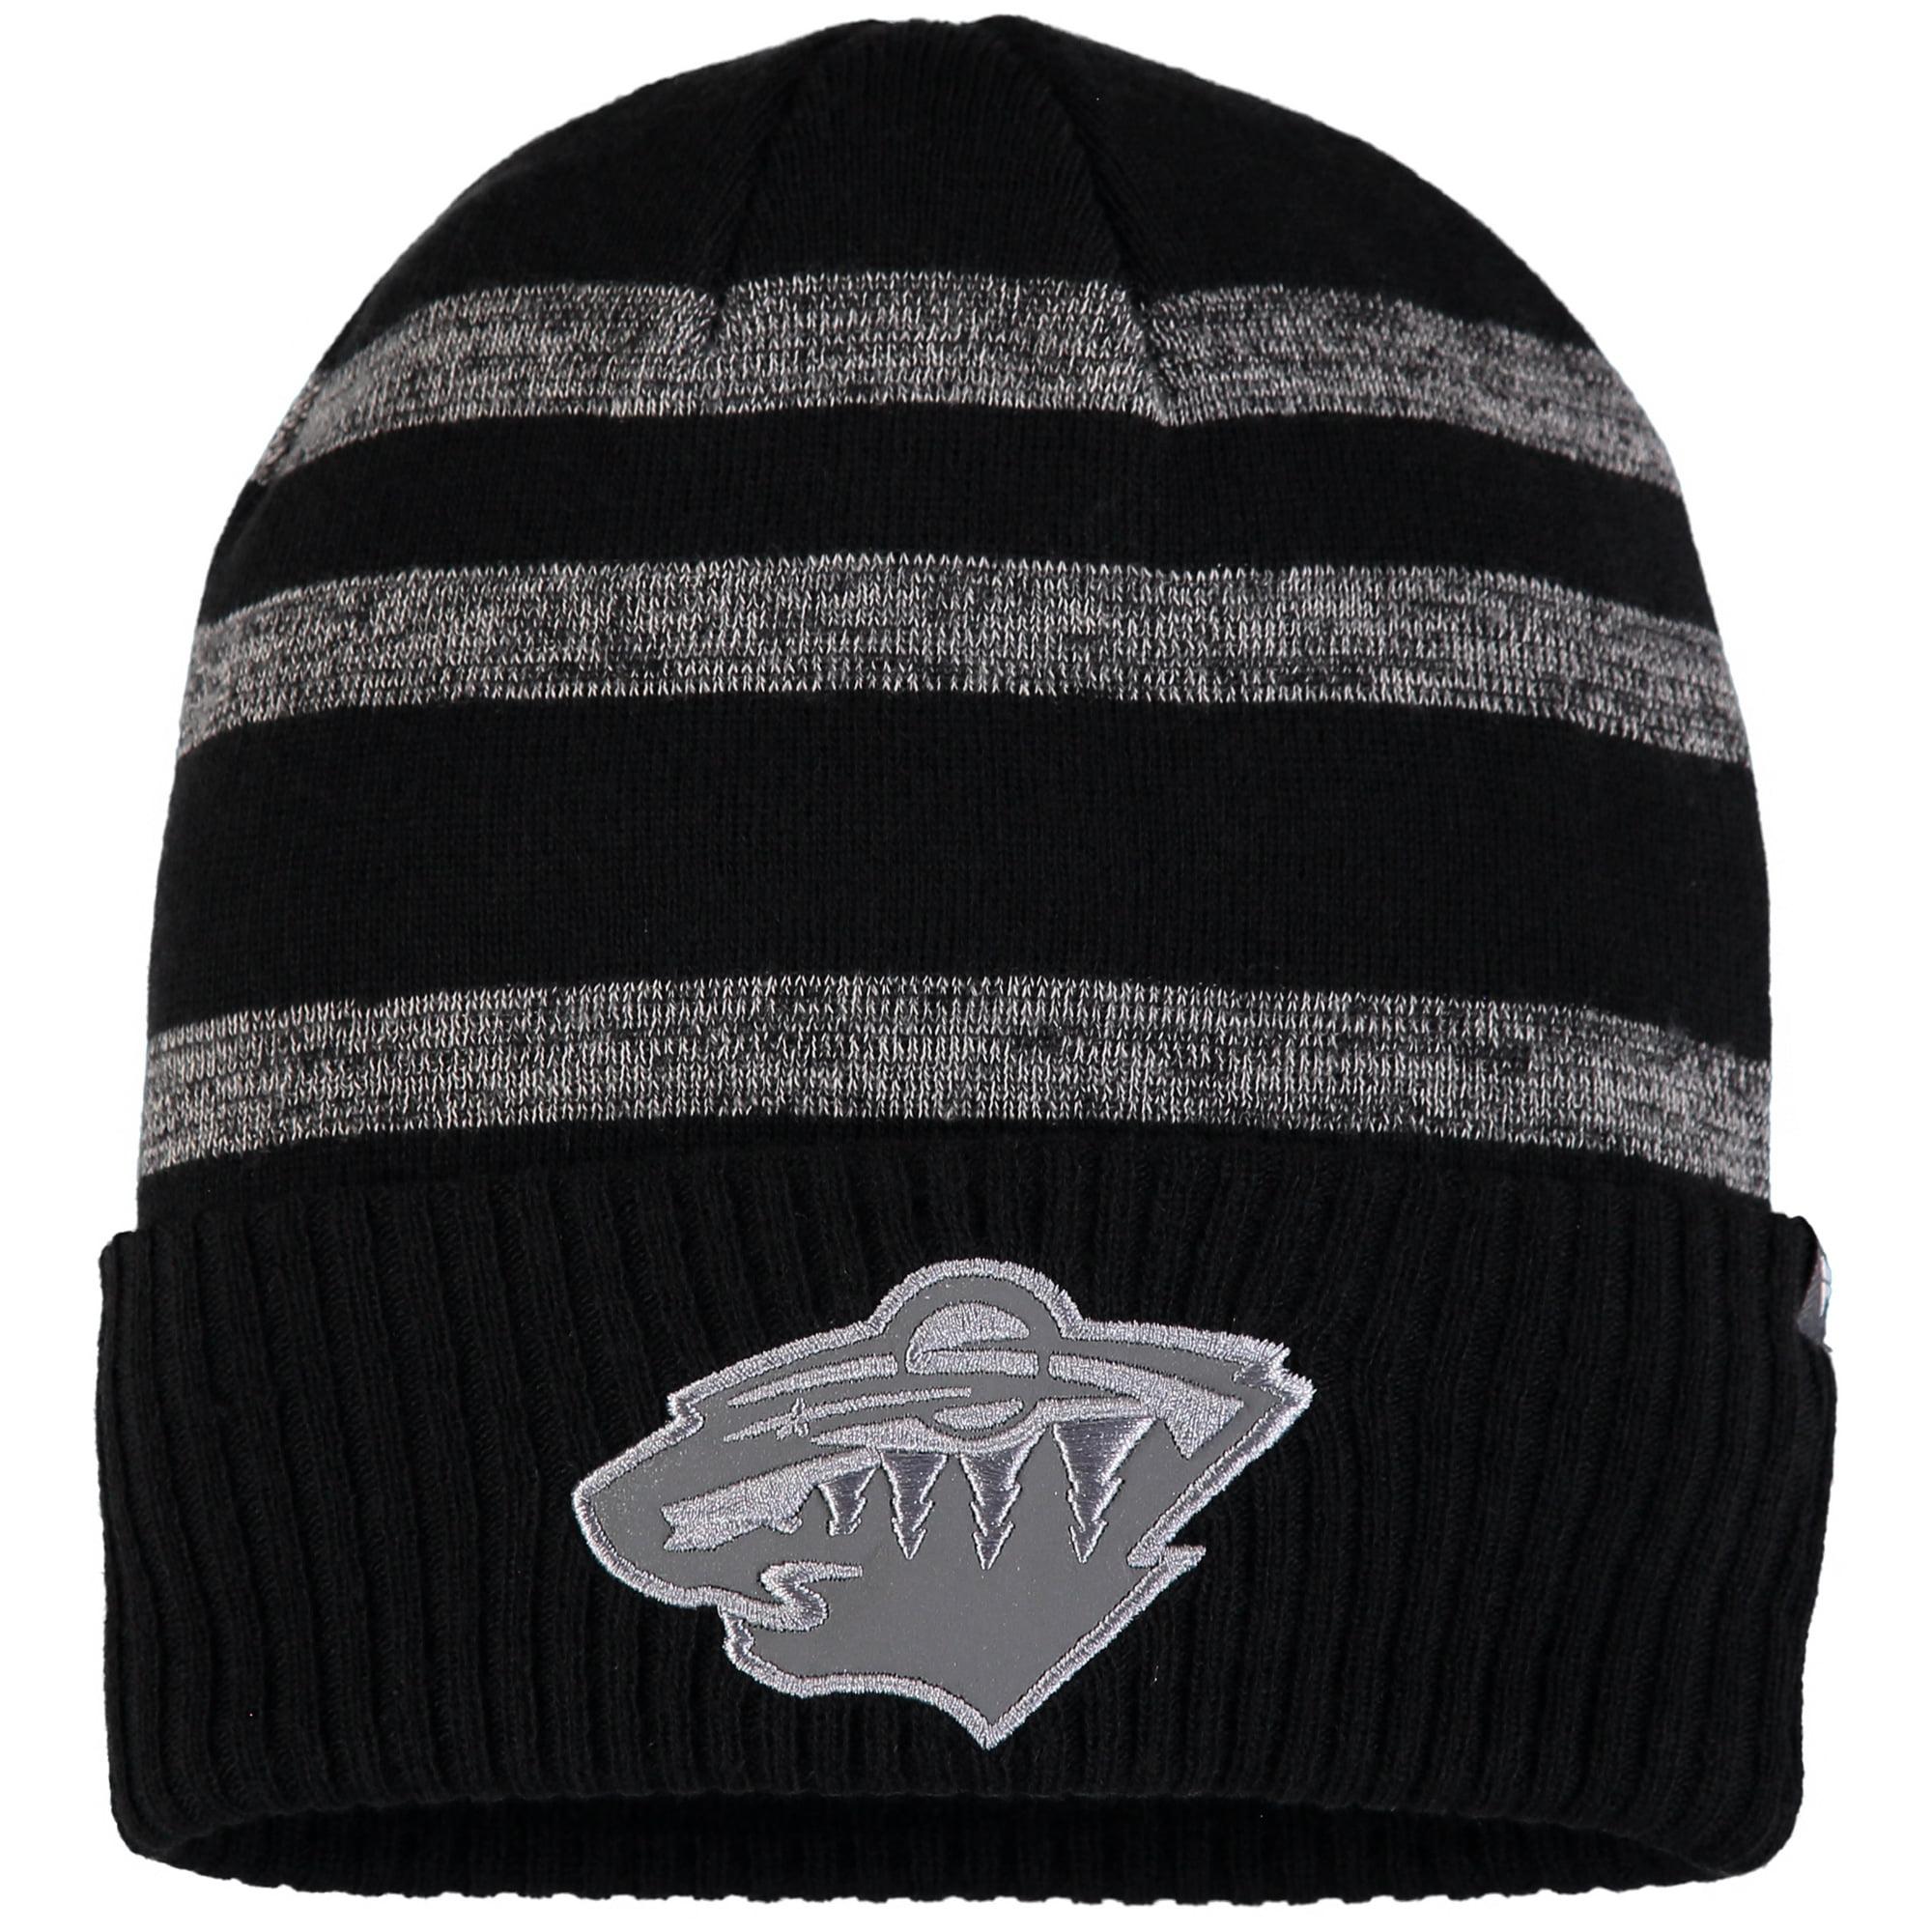 Minnesota Wild Fanatics Branded Reflective Sneaker Cuffed Knit Hat - Black/Gray - OSFA